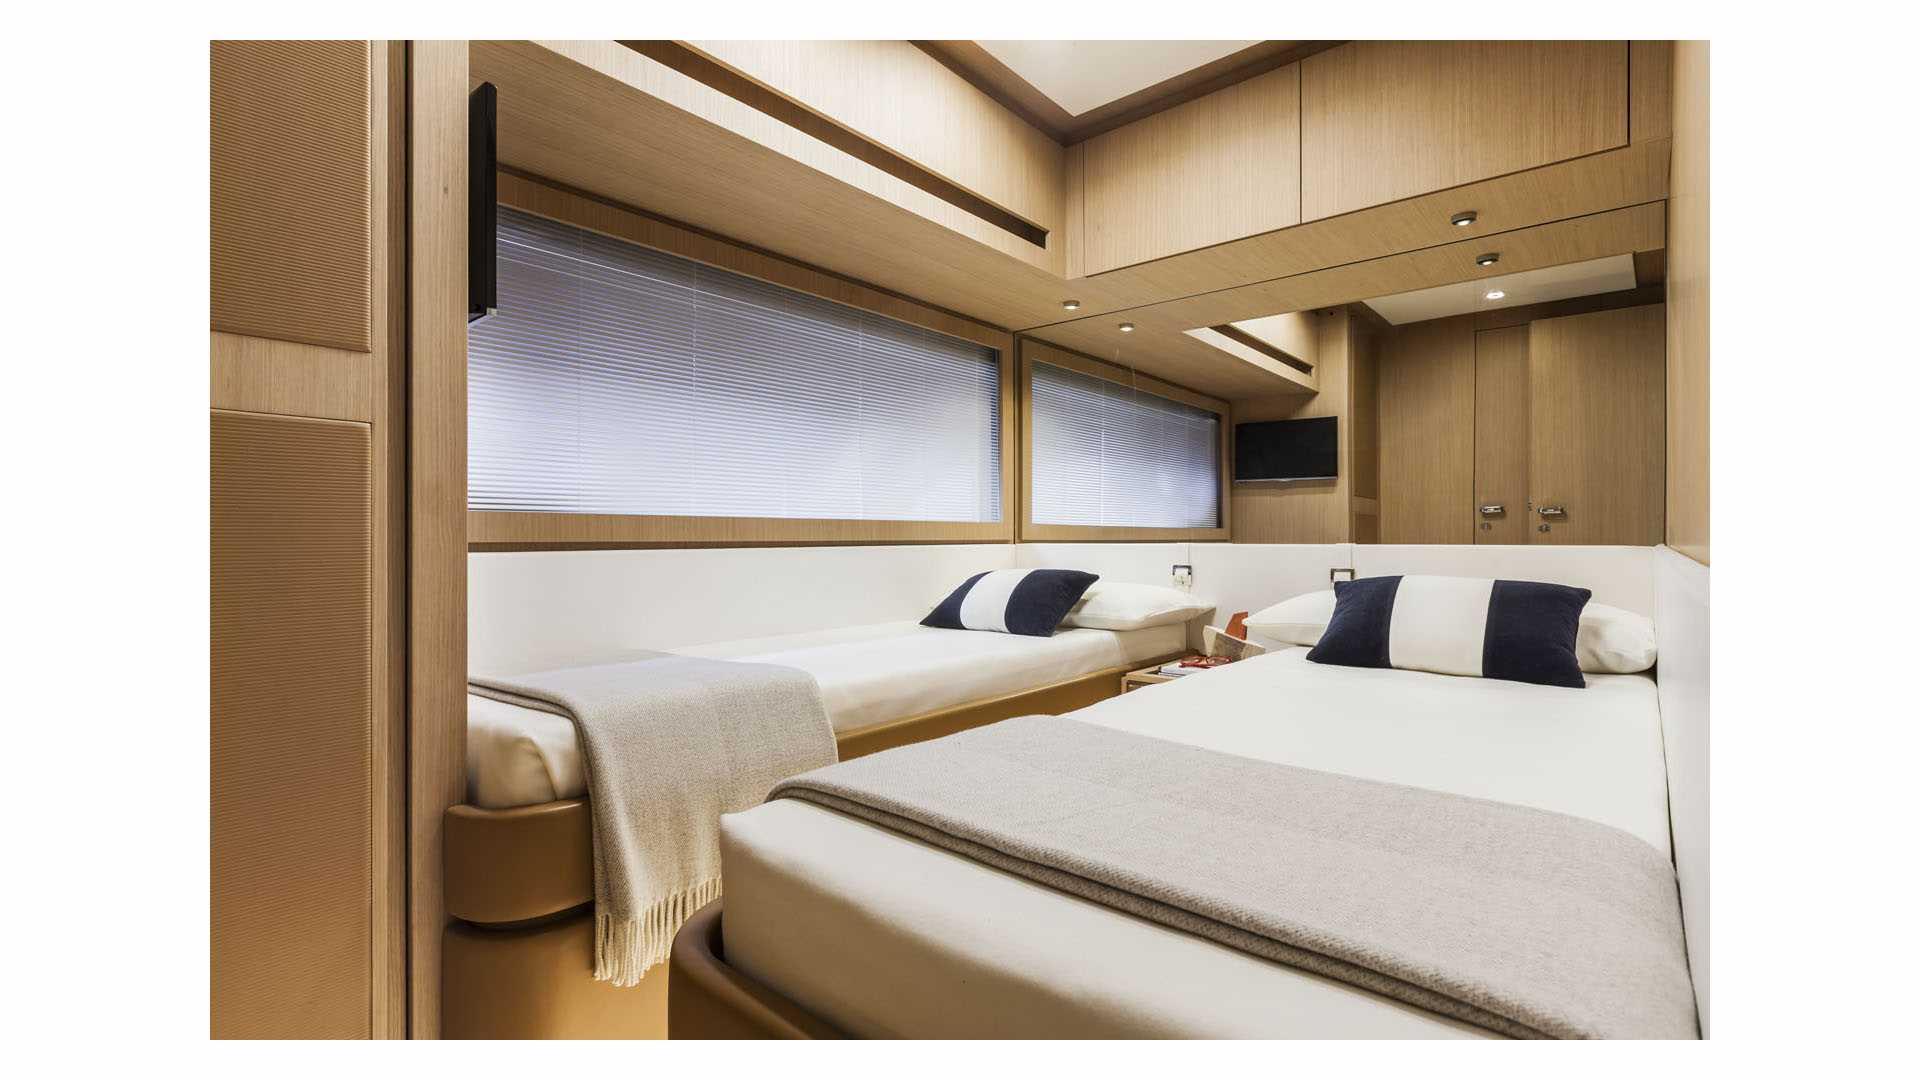 Riva 88 Florida luxusni jachta interier